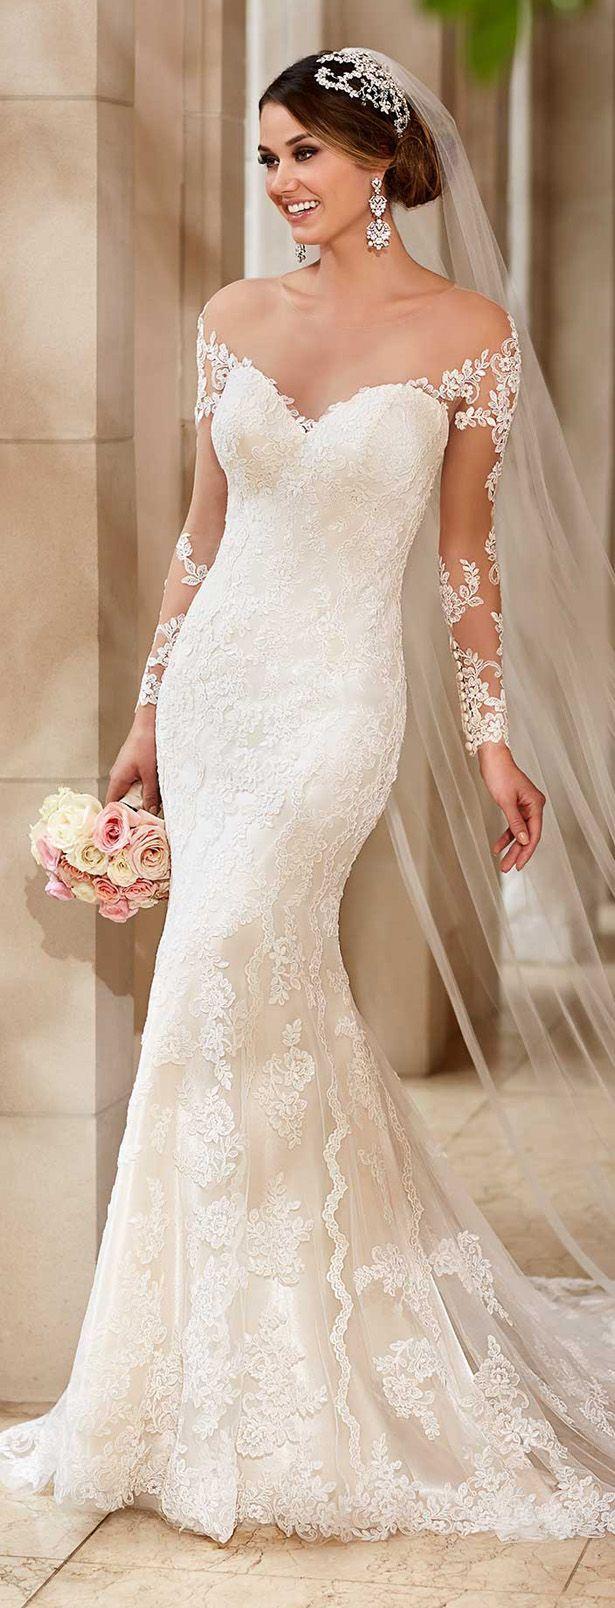 The lightbox wedding dresses   best Wedding images on Pinterest  Wedding ideas Sprinkler